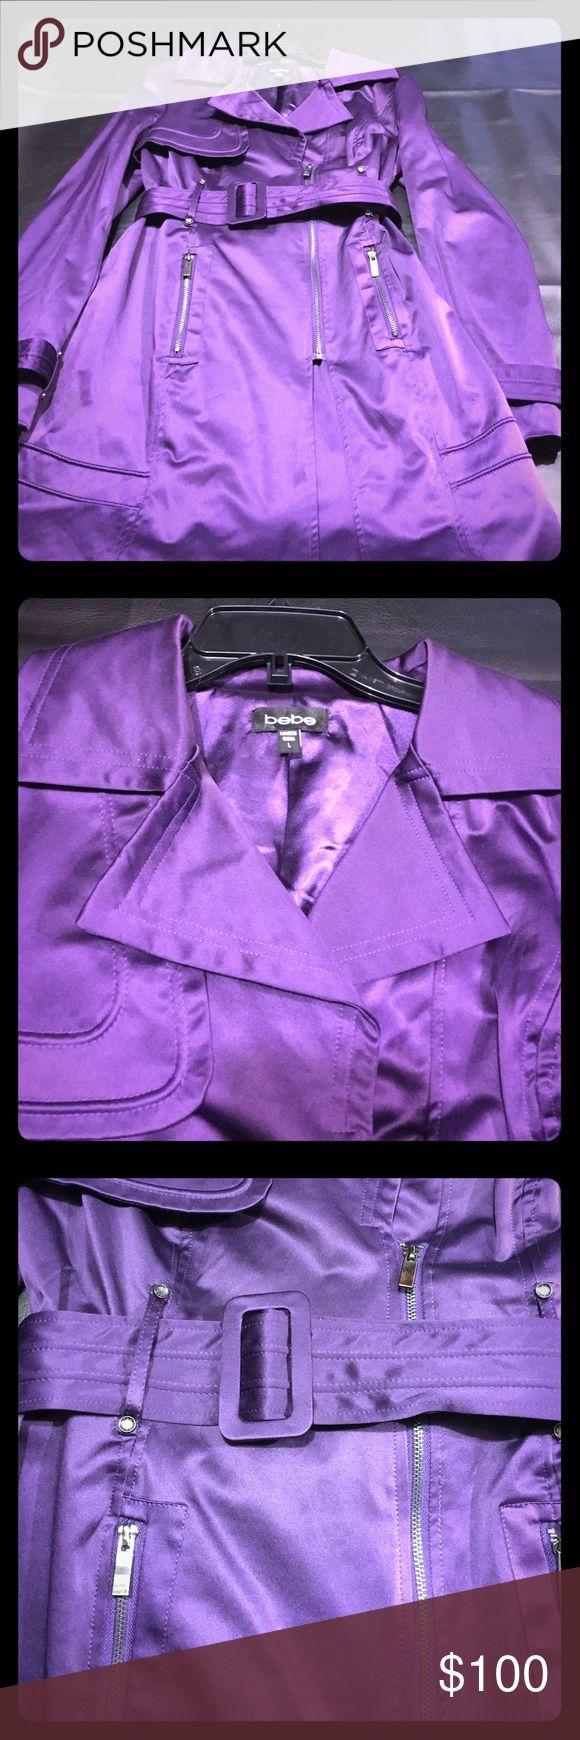 Bebe dark purple jacket Lovely dark purple trench great for a date night! bebe Jackets & Coats Trench Coats